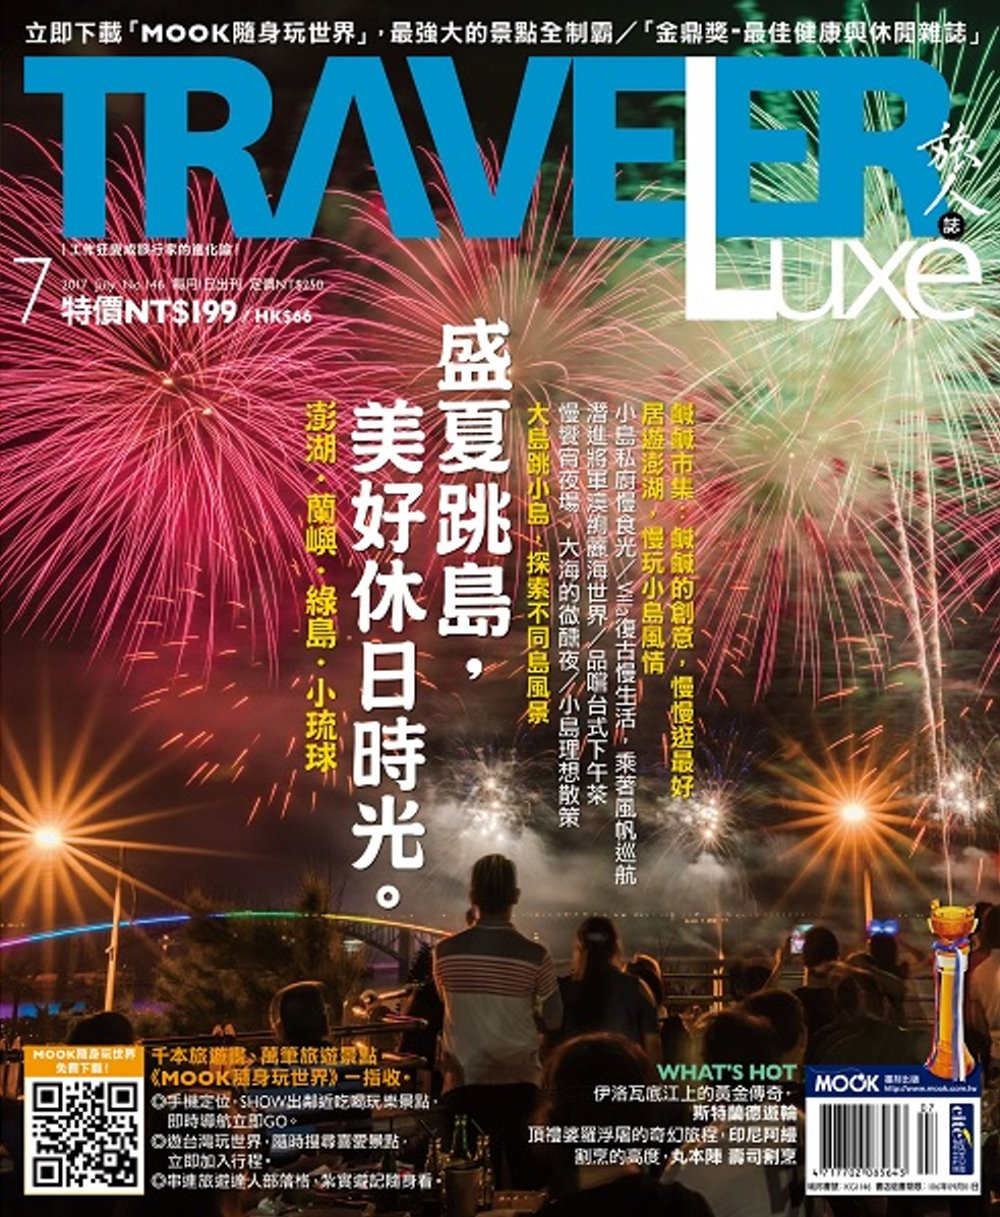 TRAVELER LUXE 旅人誌 7月號/2017 第146期